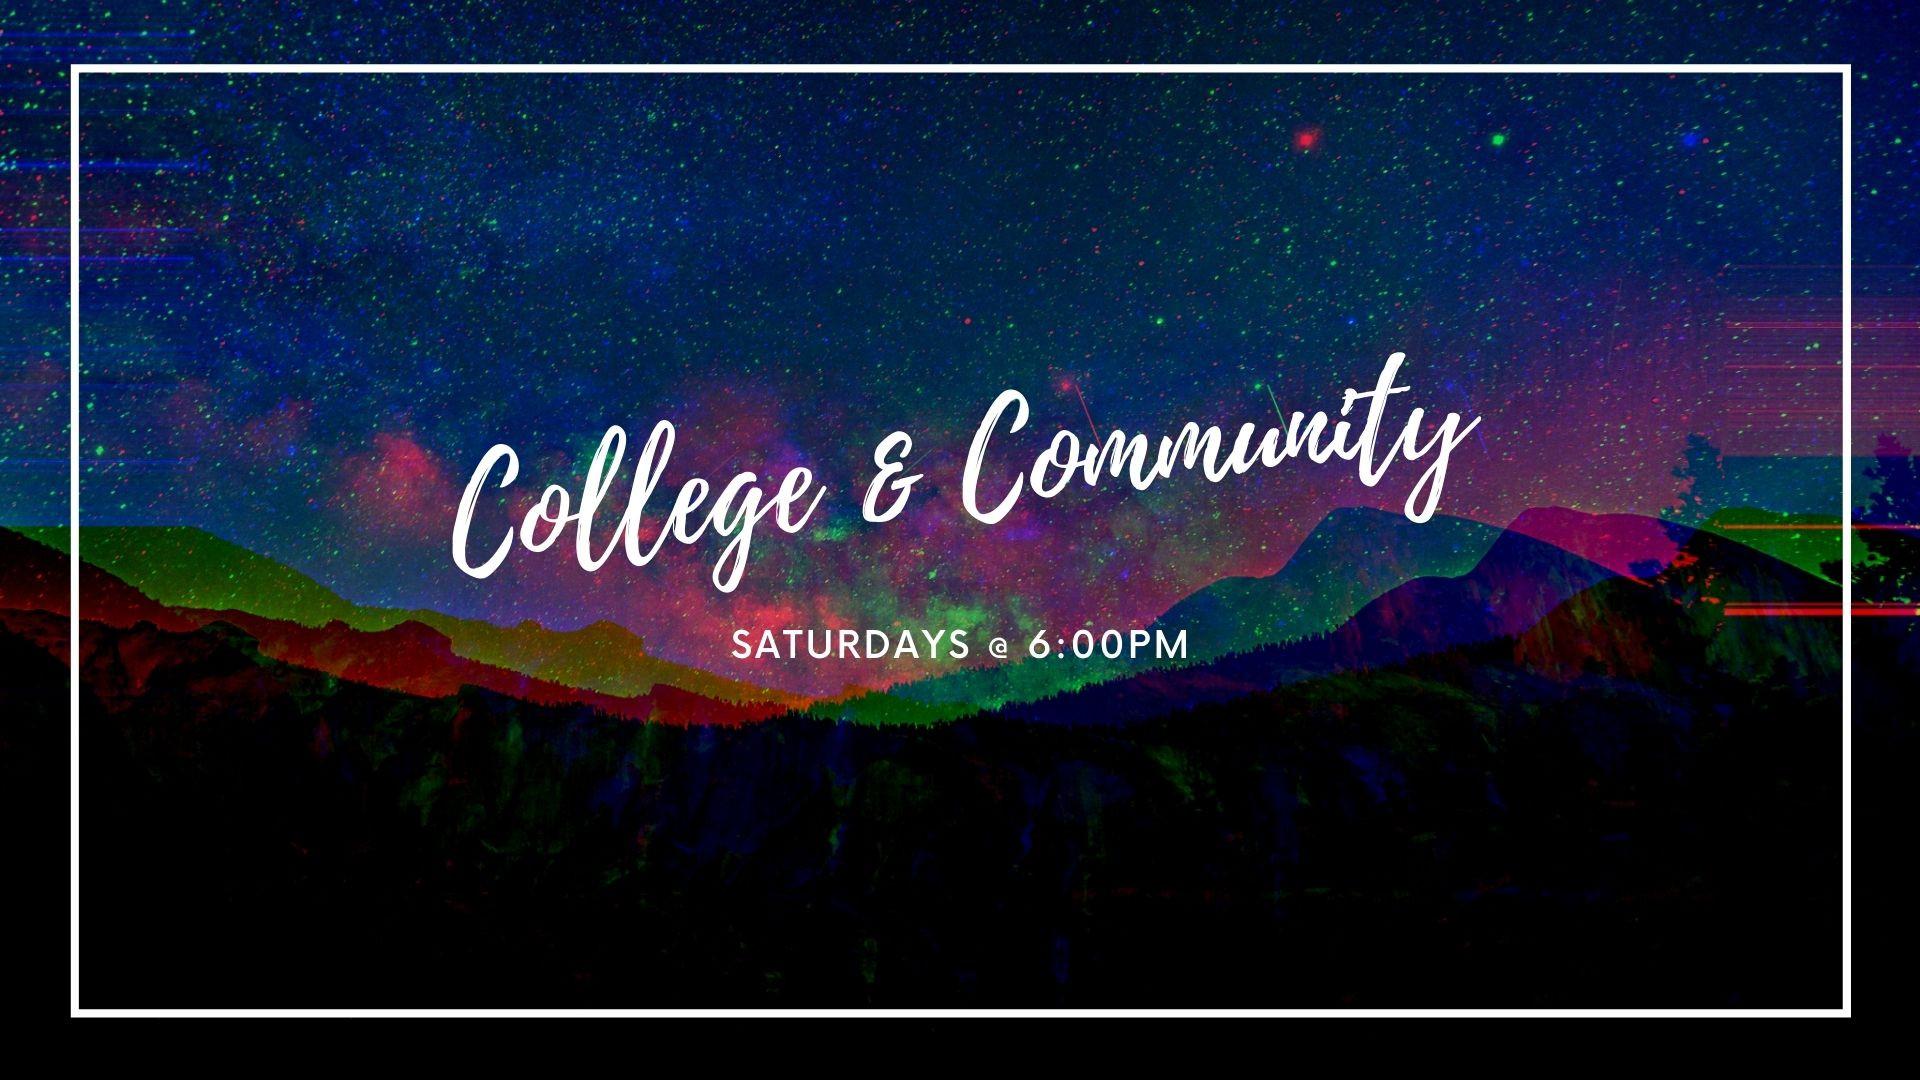 College & Community